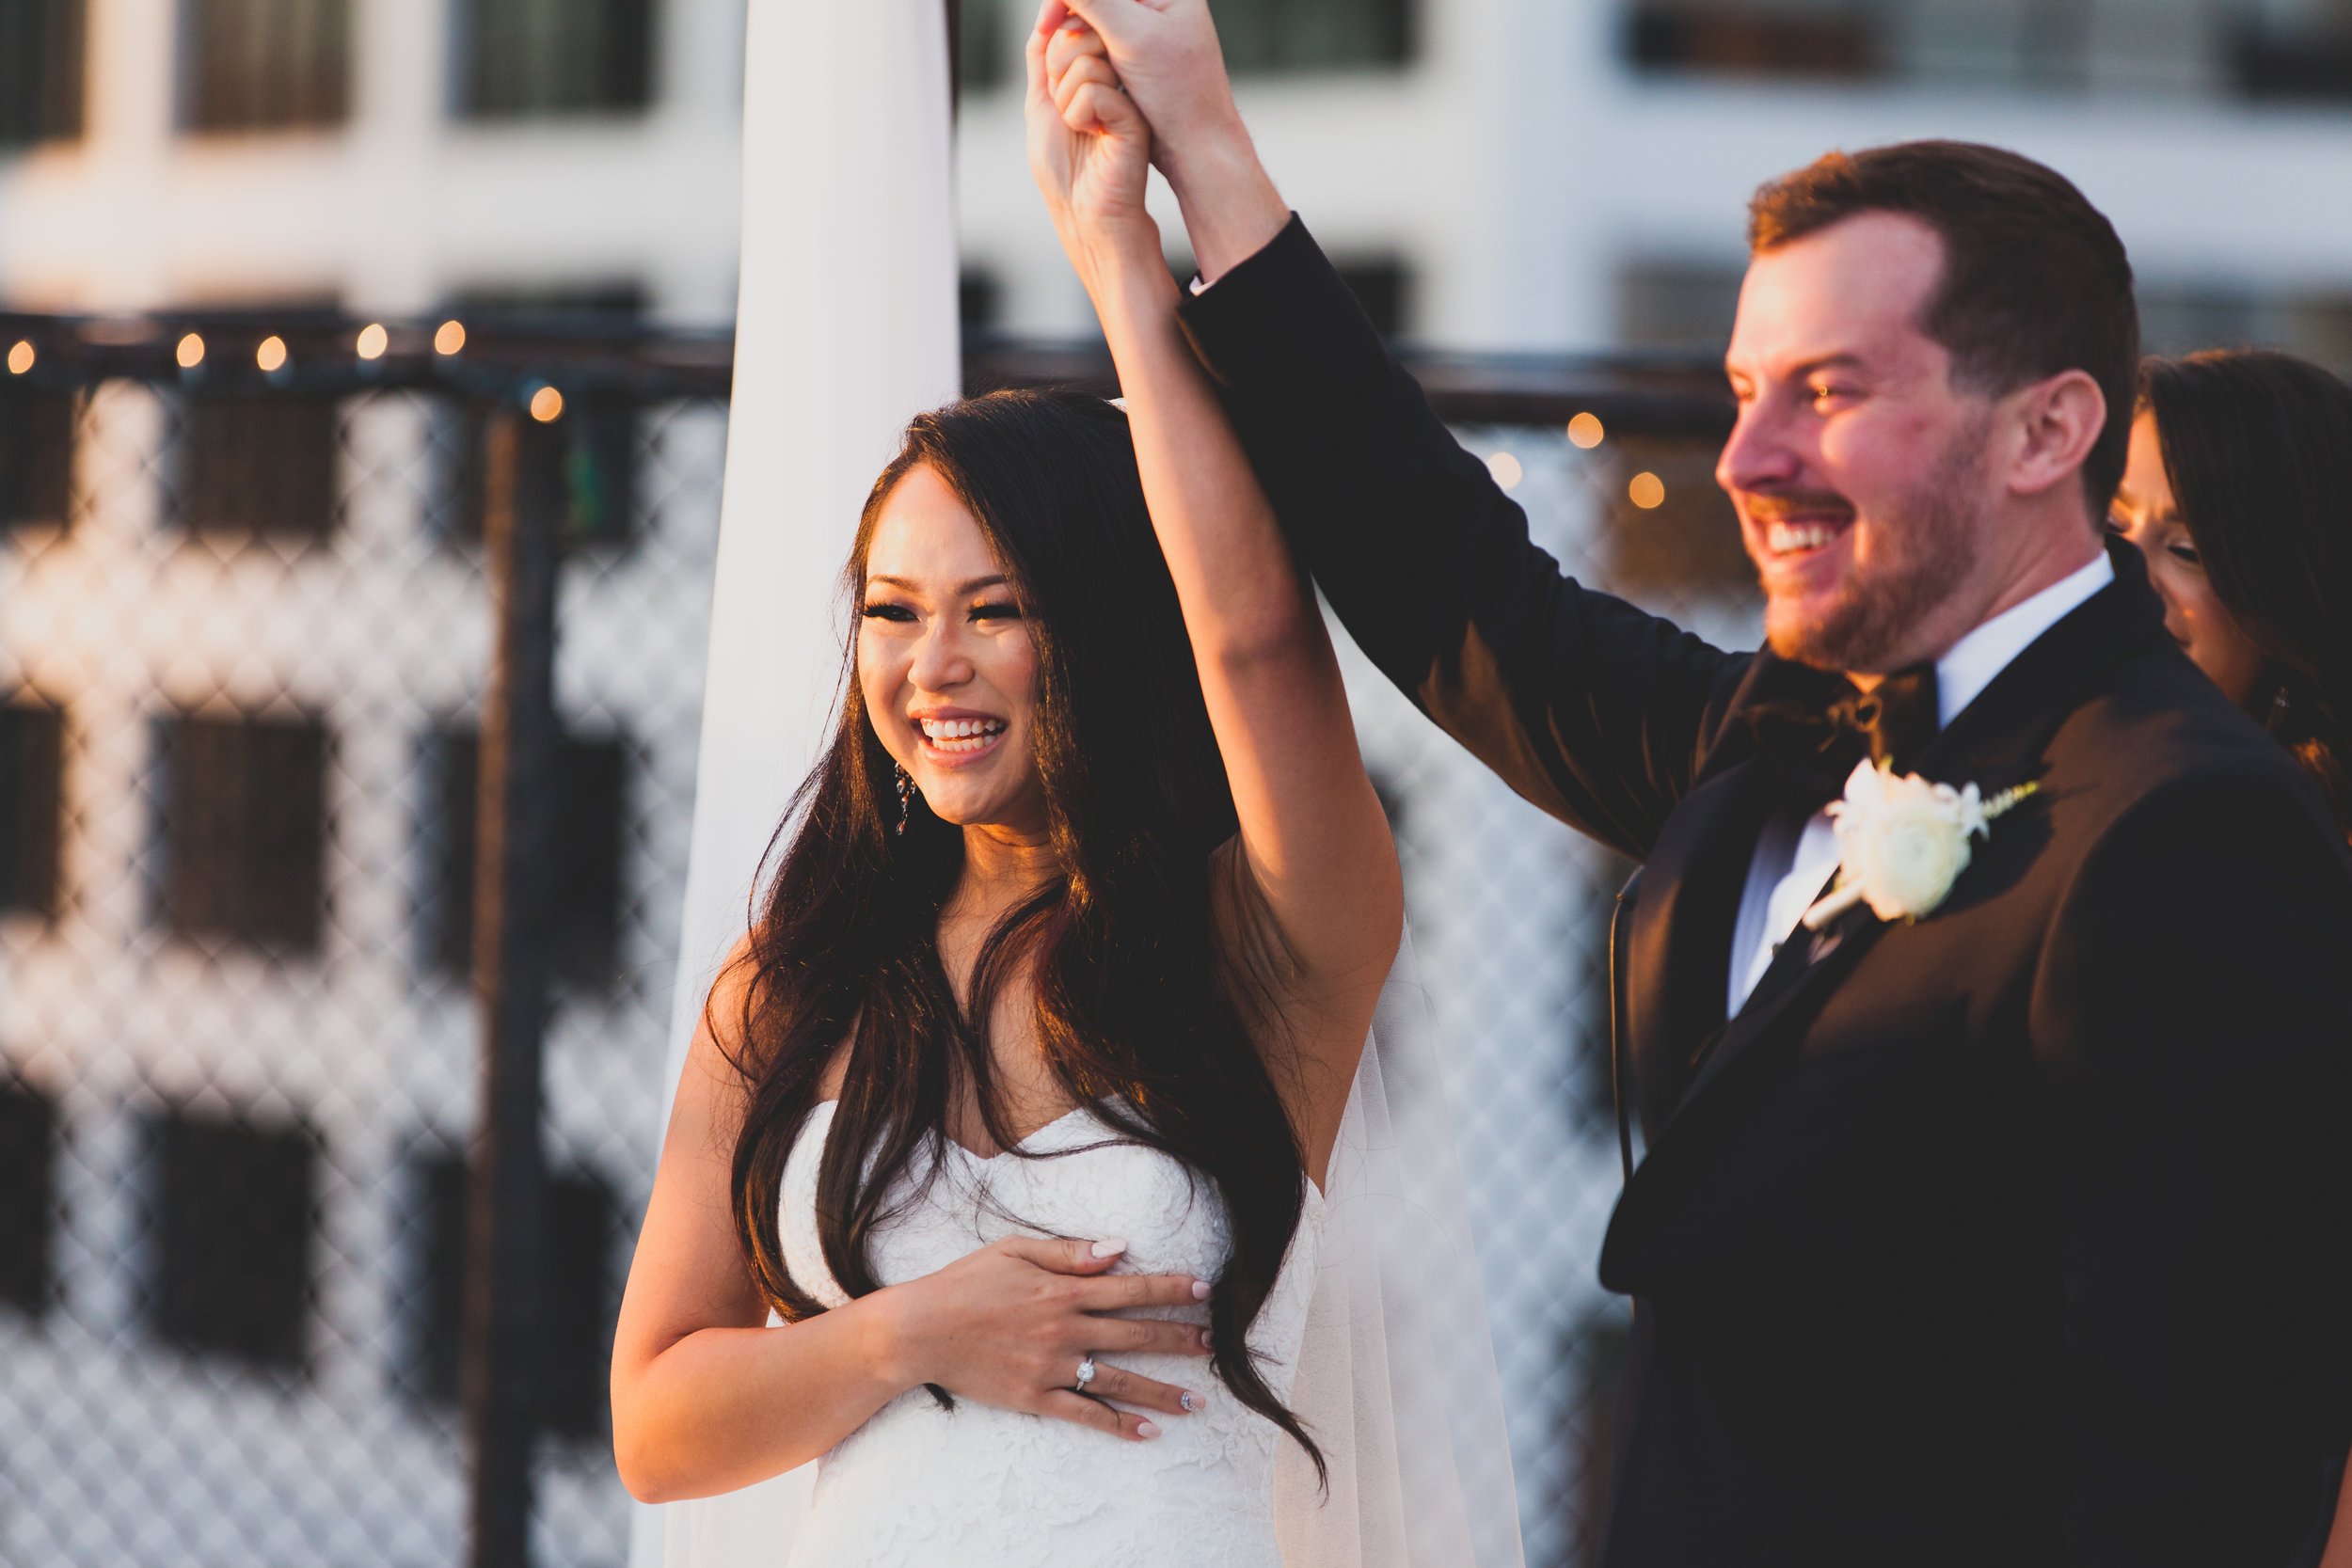 Bride and groom raising their held hands in appreciation.